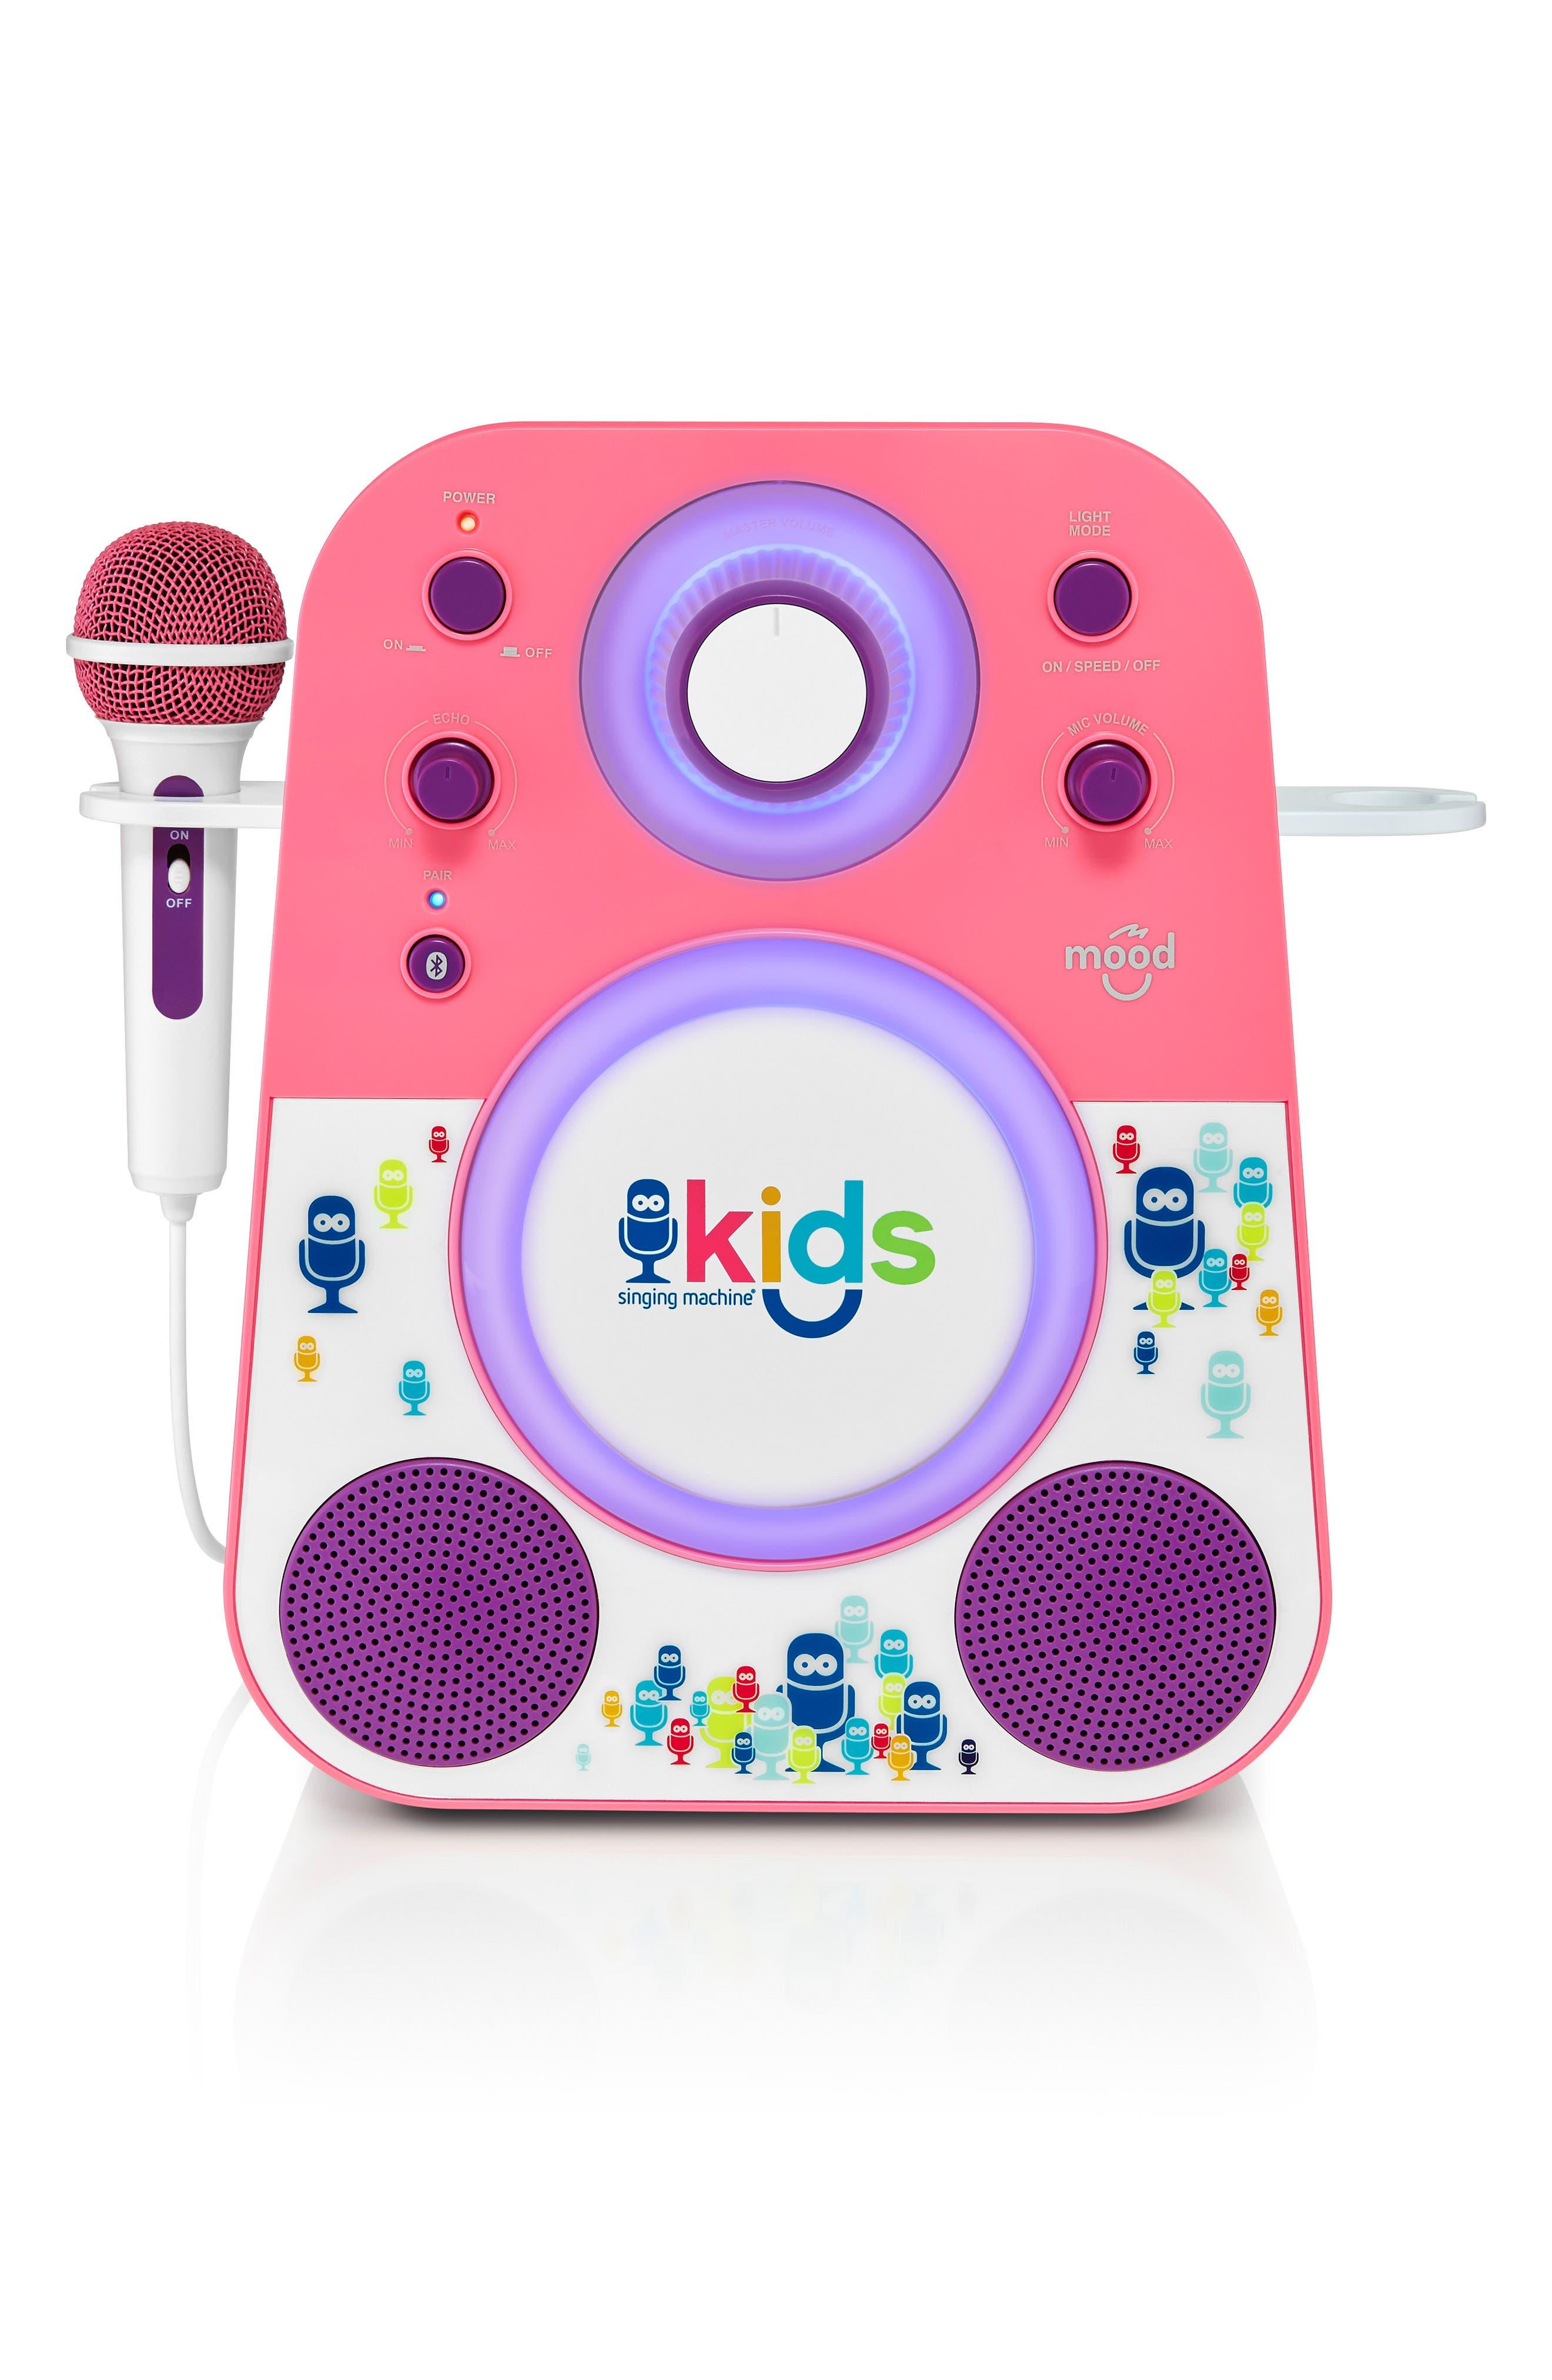 Kids Mood Karaoke System,                             Main thumbnail 1, color,                             PINK PURPLE